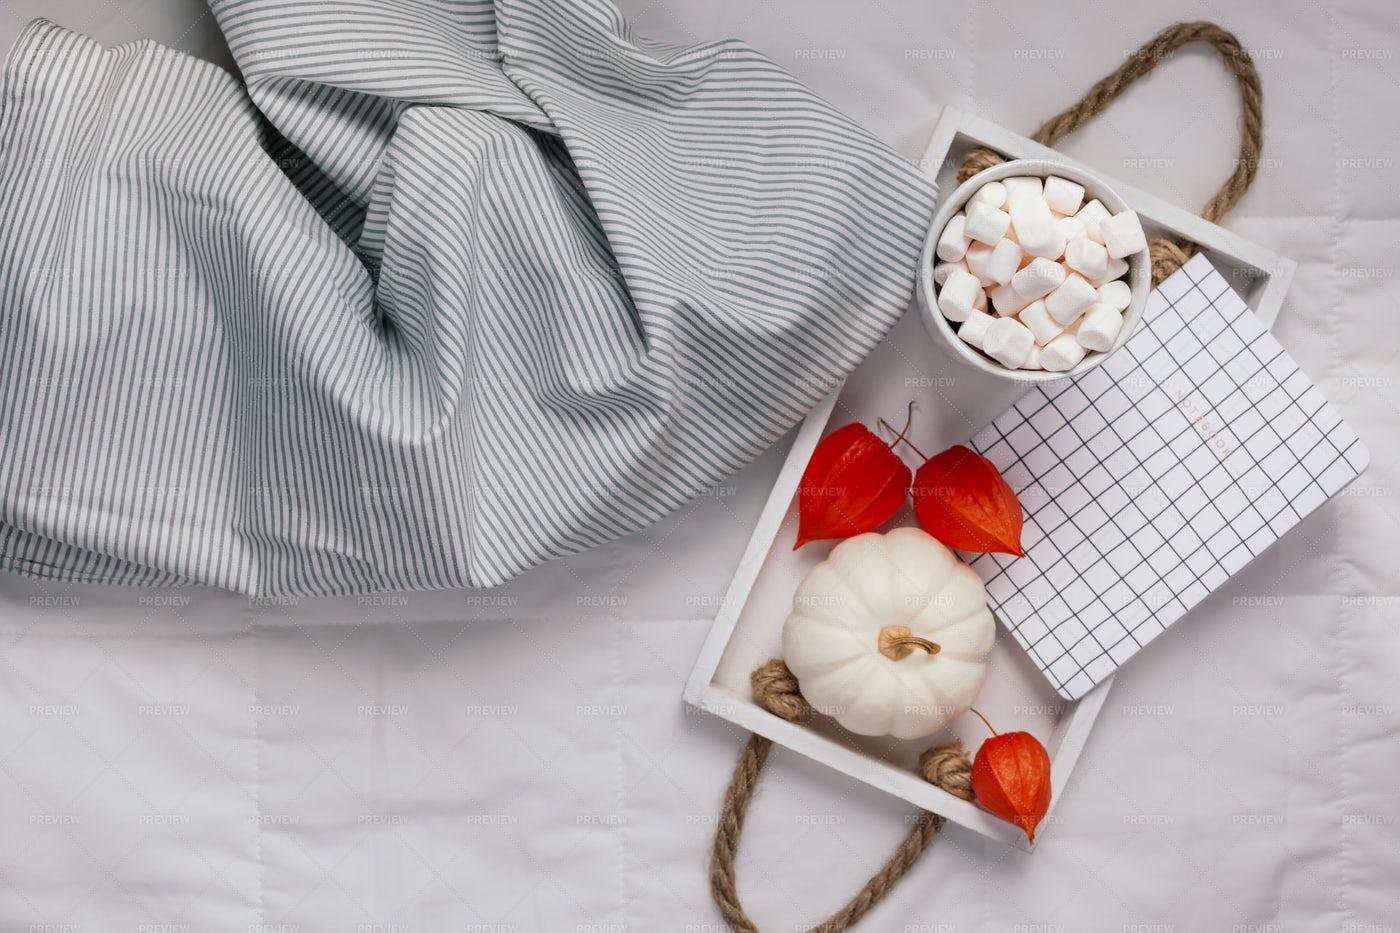 Tray With Cozy Food: Stock Photos